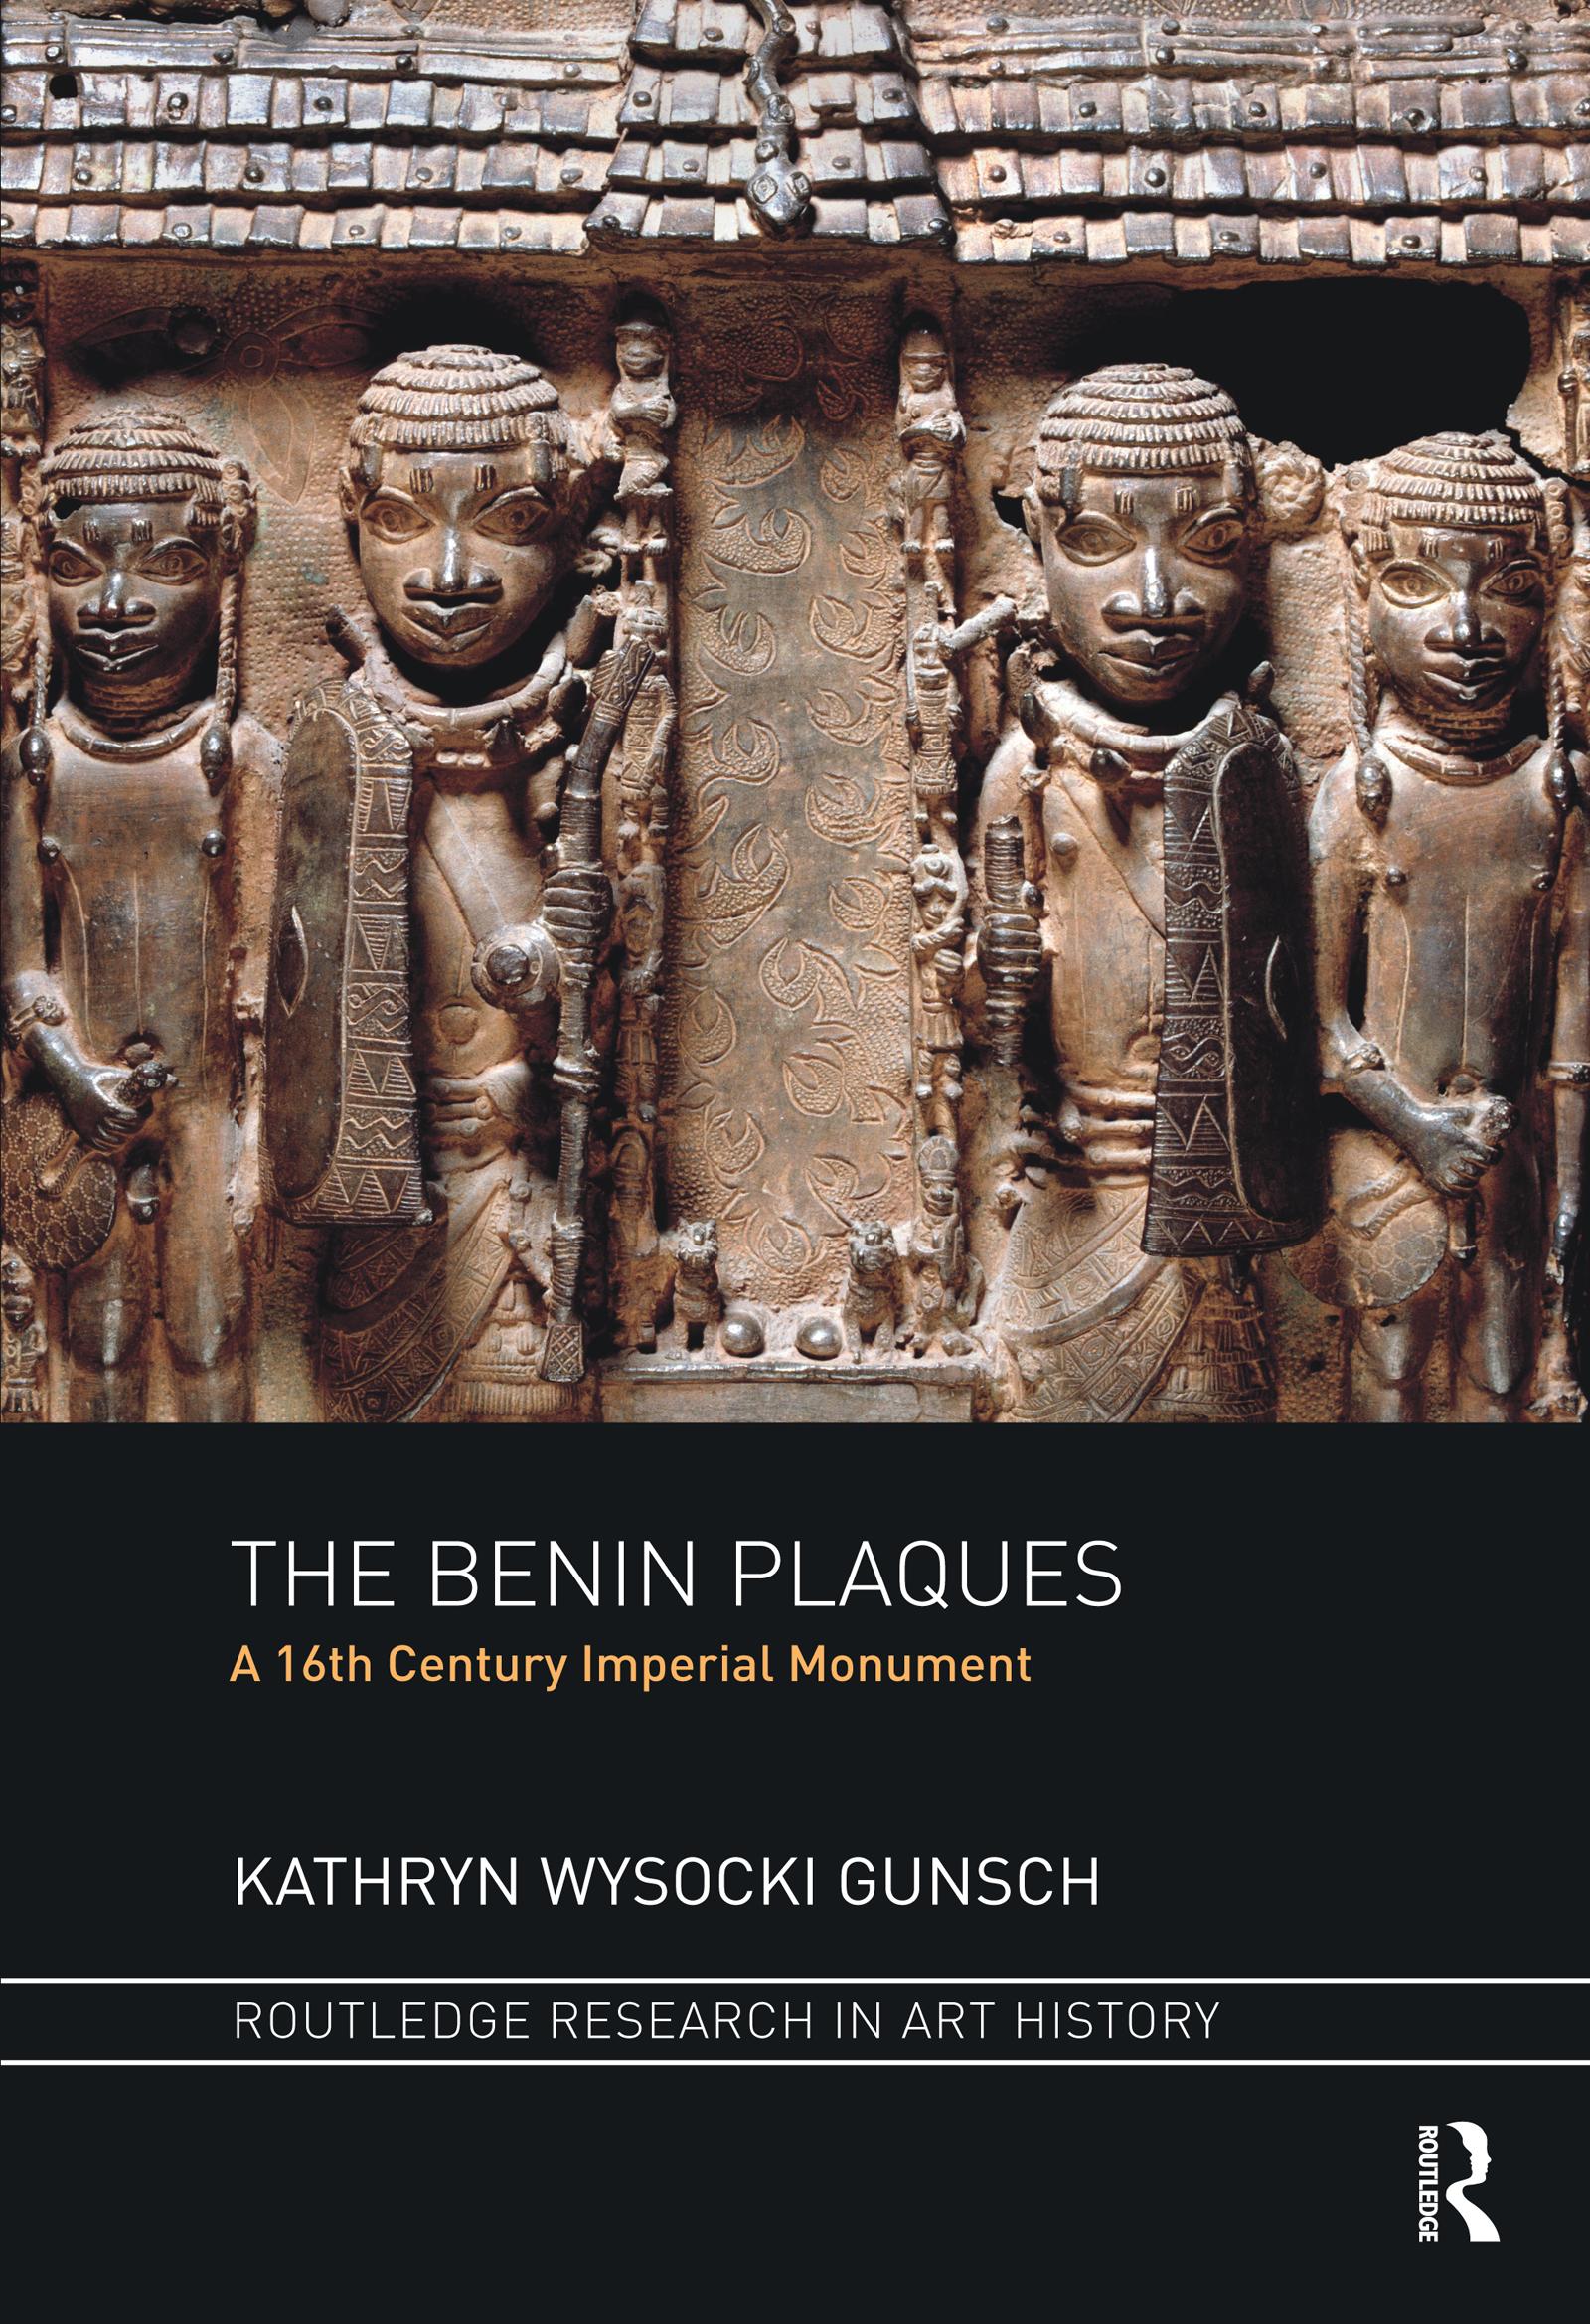 The Benin Plaques